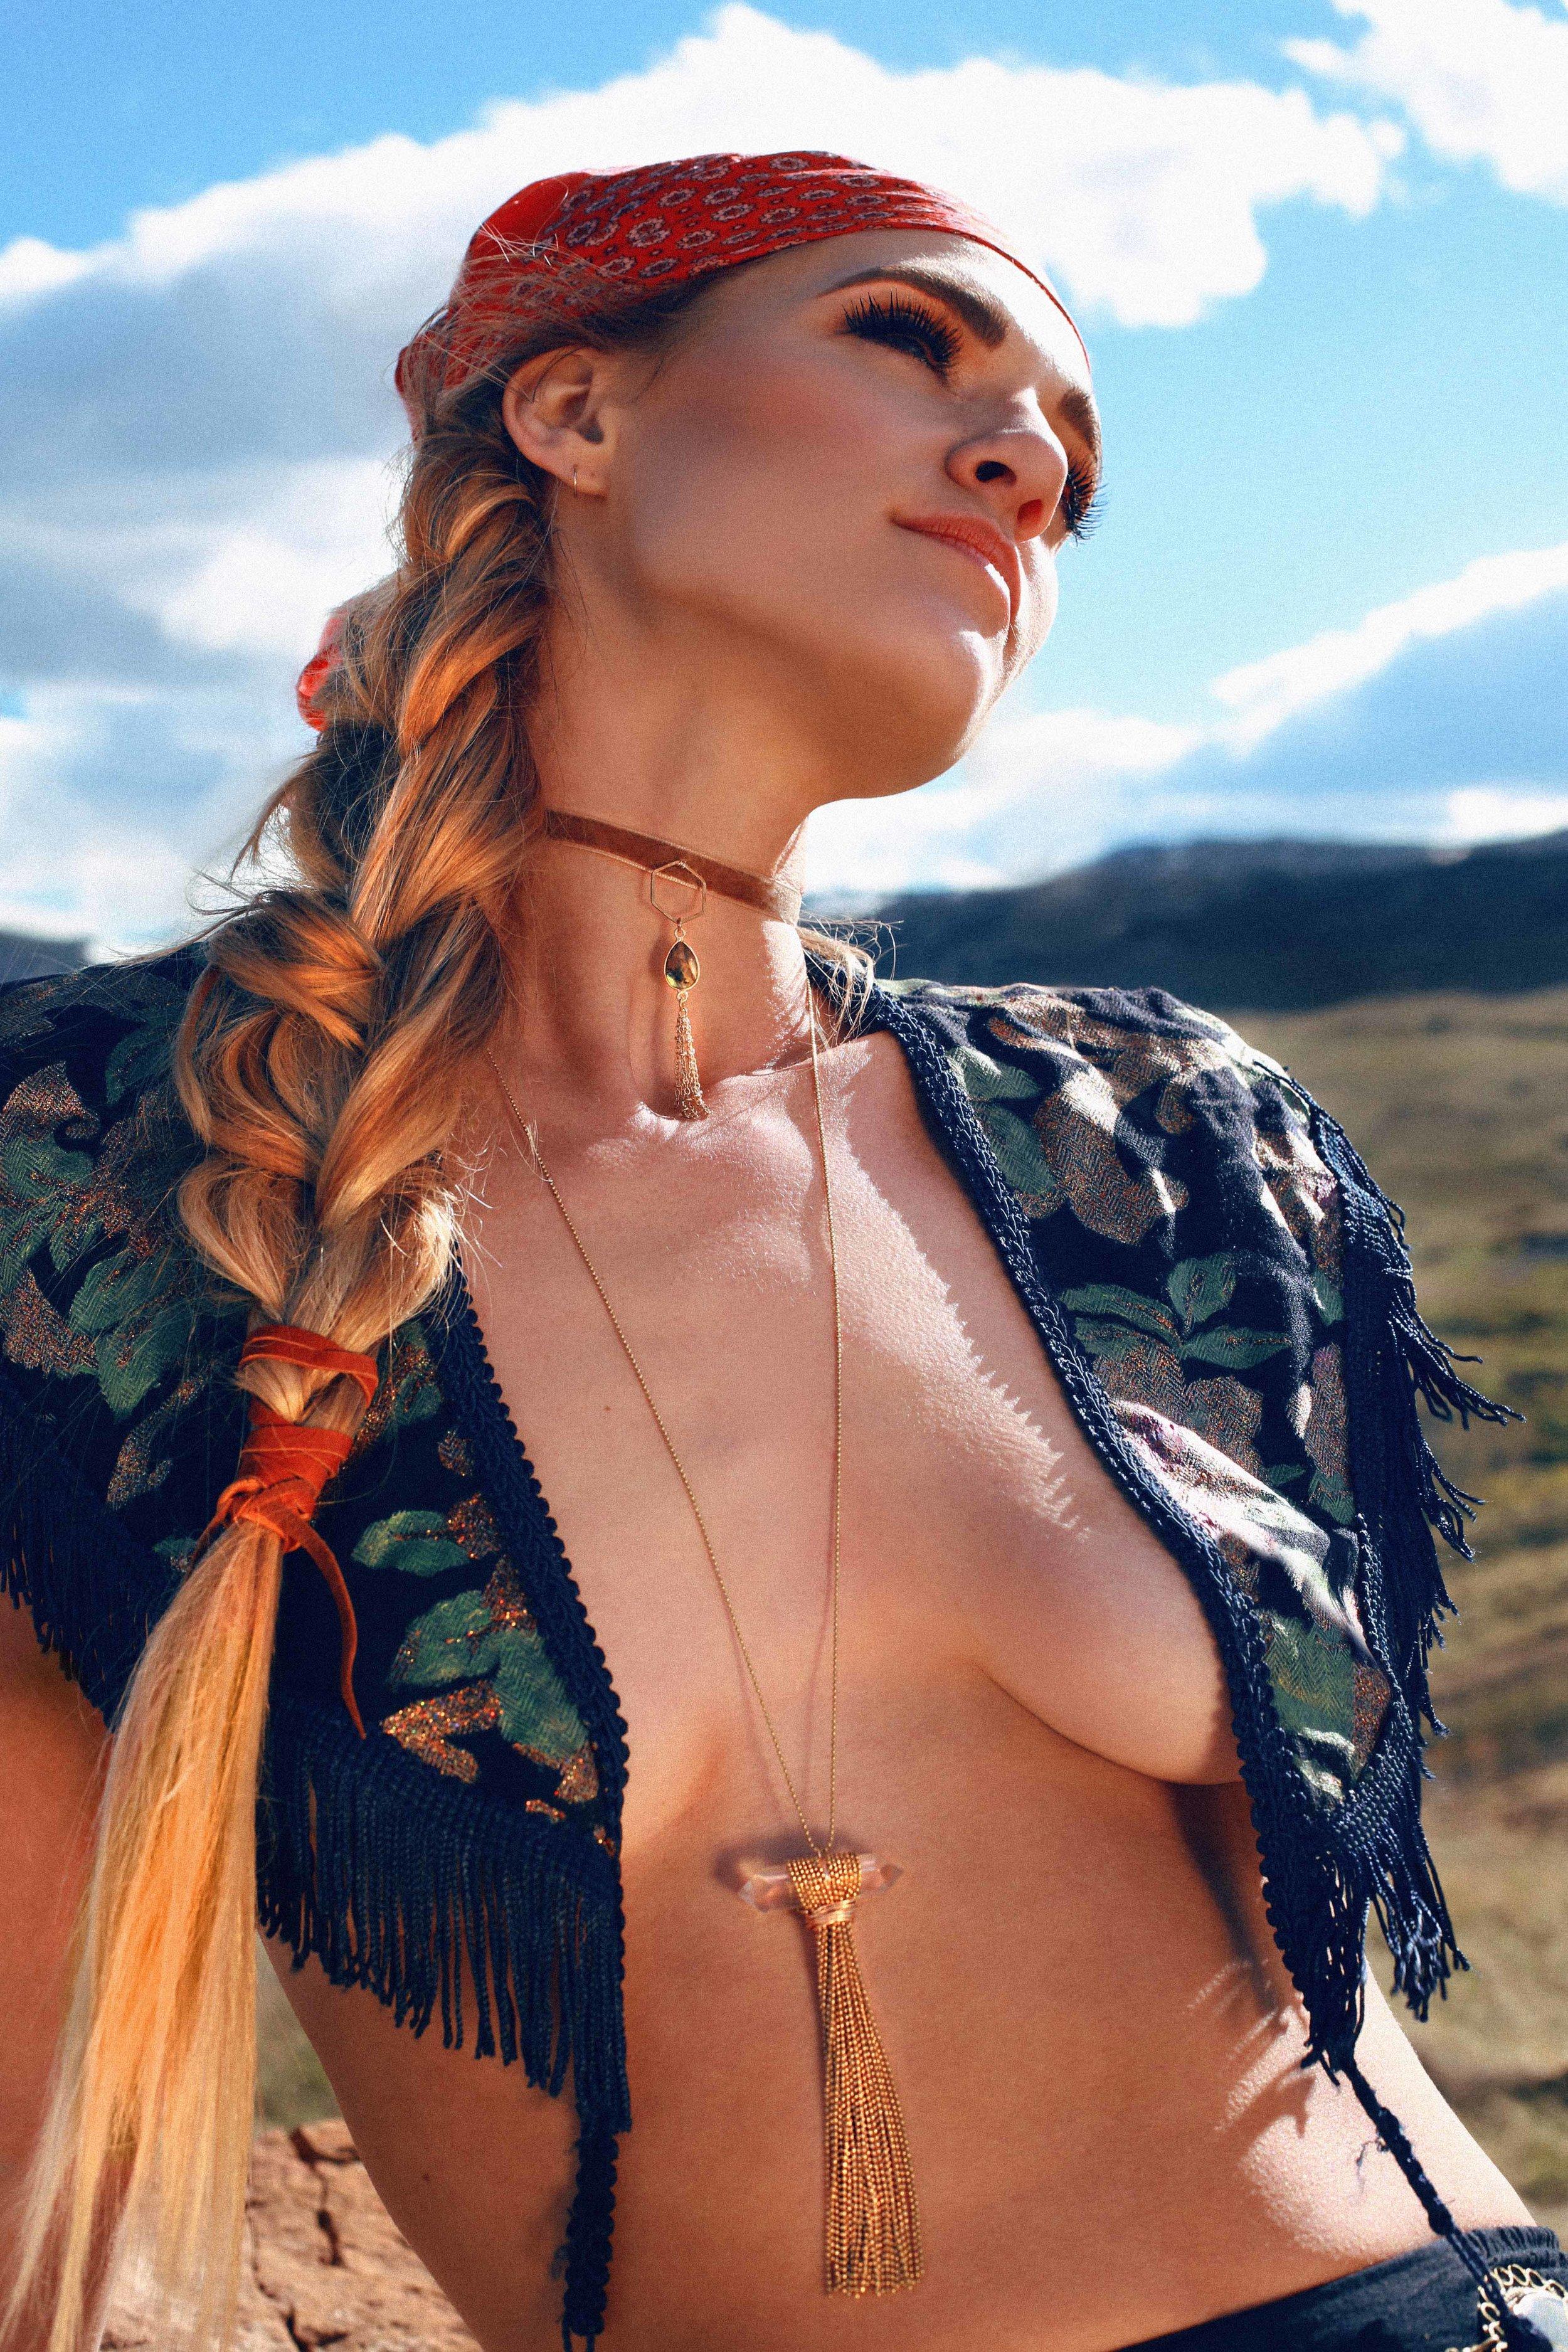 COLORADO GYPSY DREAMIN' - Photo Shoot Story shot by Alyssa Risley - IG @alyssarisley #BLUESKY #CLOUDS #EDITORIAL #JEWELRY